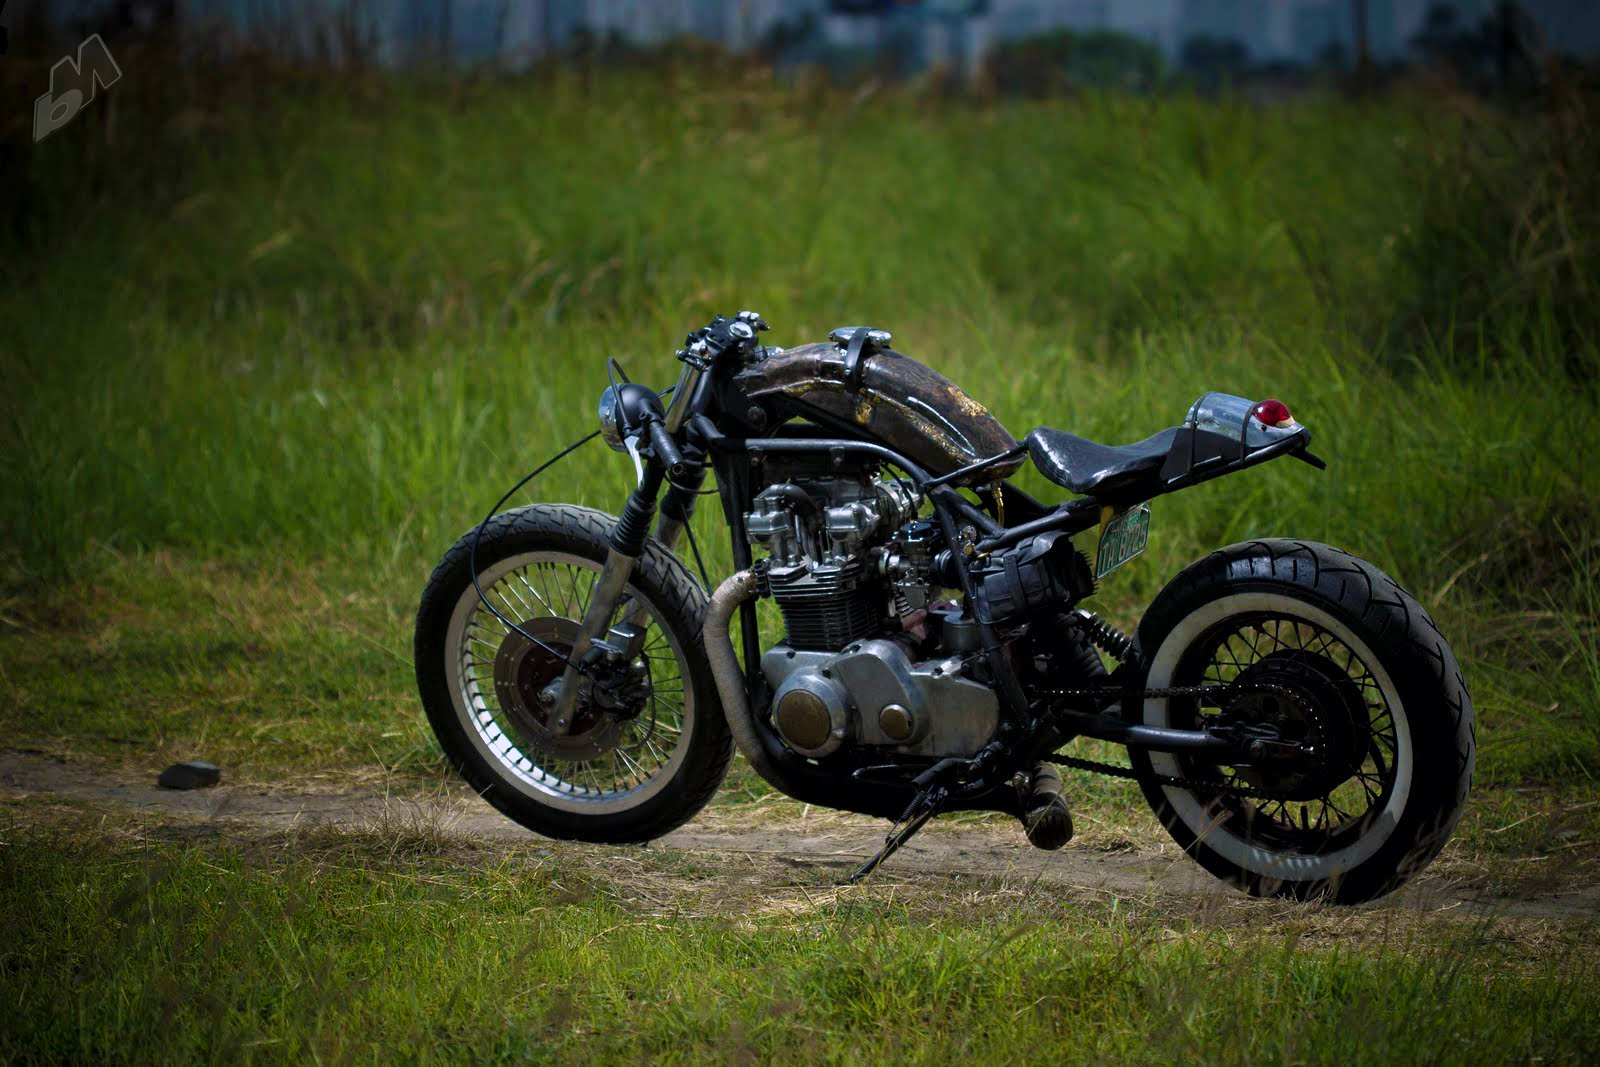 Killer Bobberish Kawasaki Kz750 Monstrosity By 13 Lucky